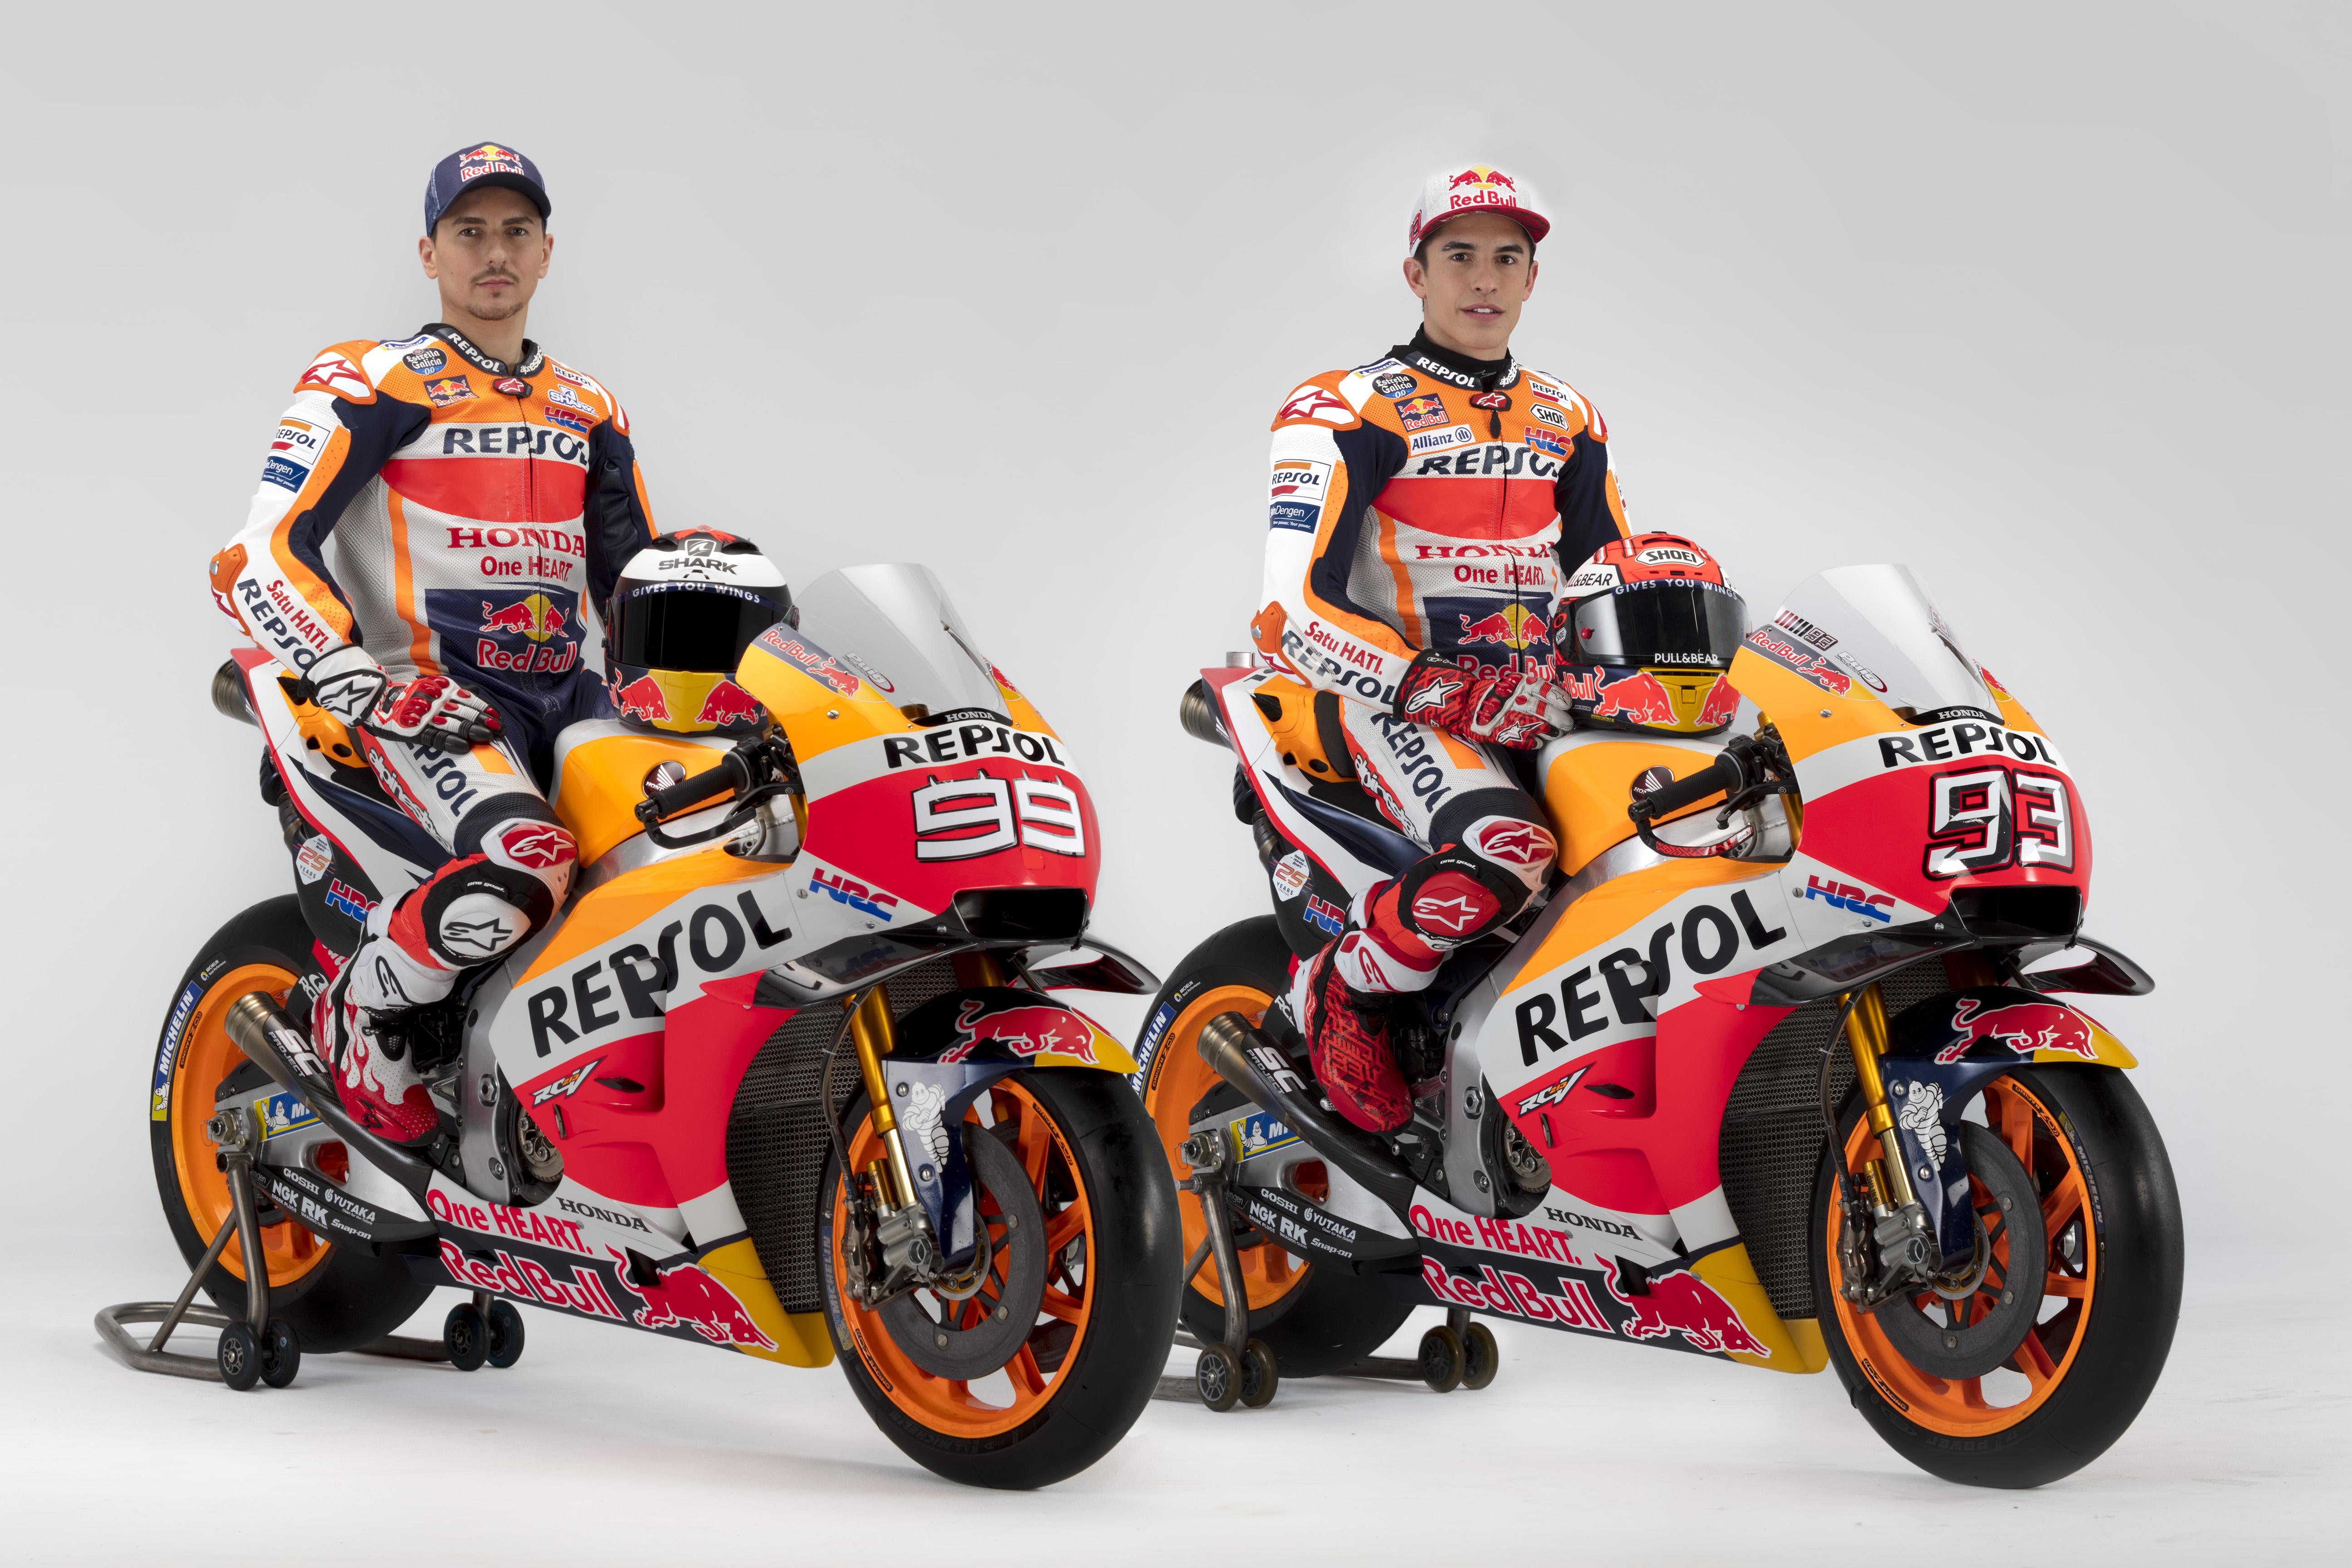 repsol-team2019-marquez-phai-lorenzo-trai.jpg